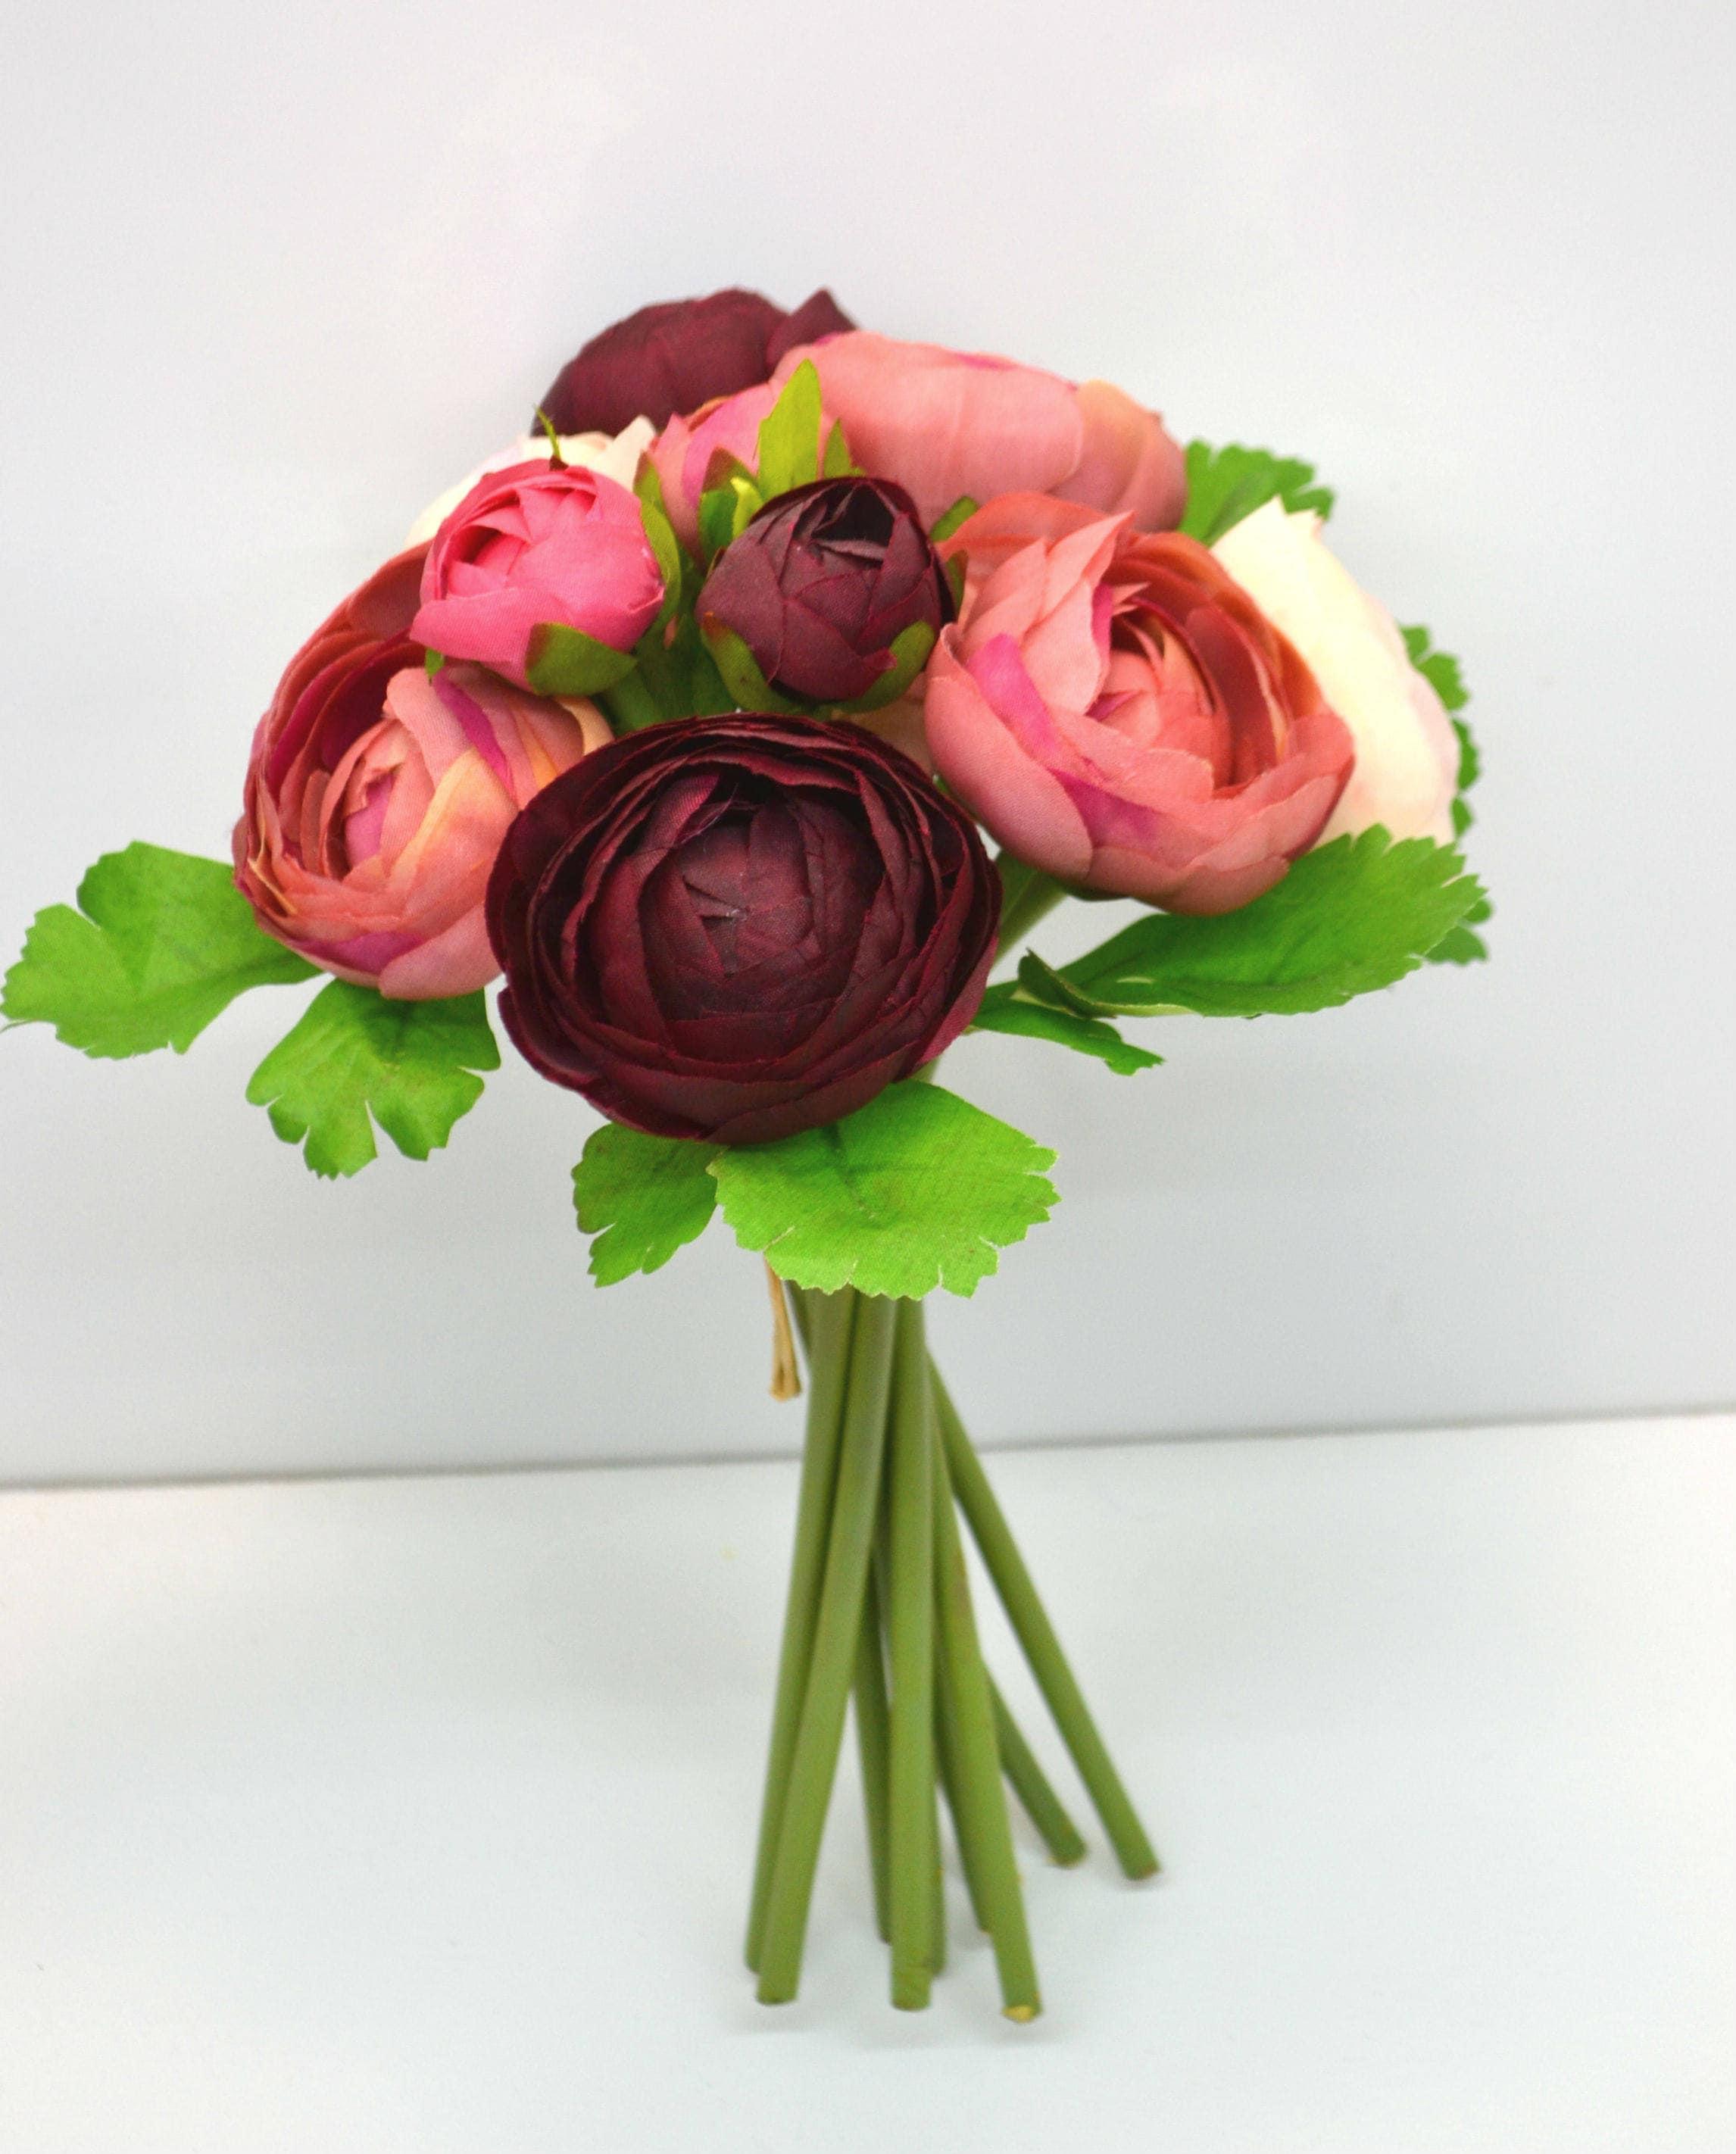 Ranunculus bouquet burgundy flowers wedding bouquets silk flowers crown real touch flowers home decor sold by decorflowershop izmirmasajfo